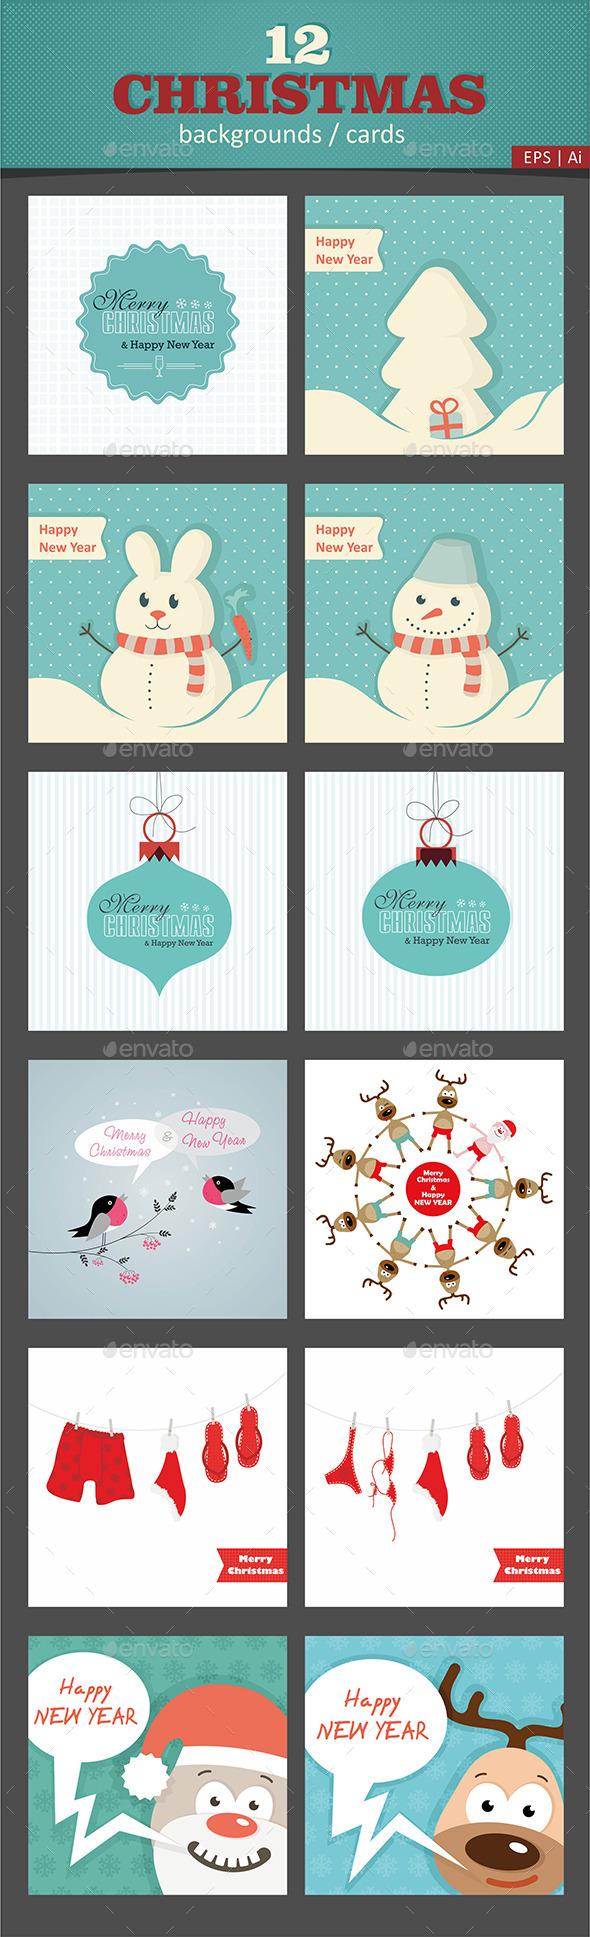 12 Christmas Vector Cards / Backgrounds - Christmas Seasons/Holidays